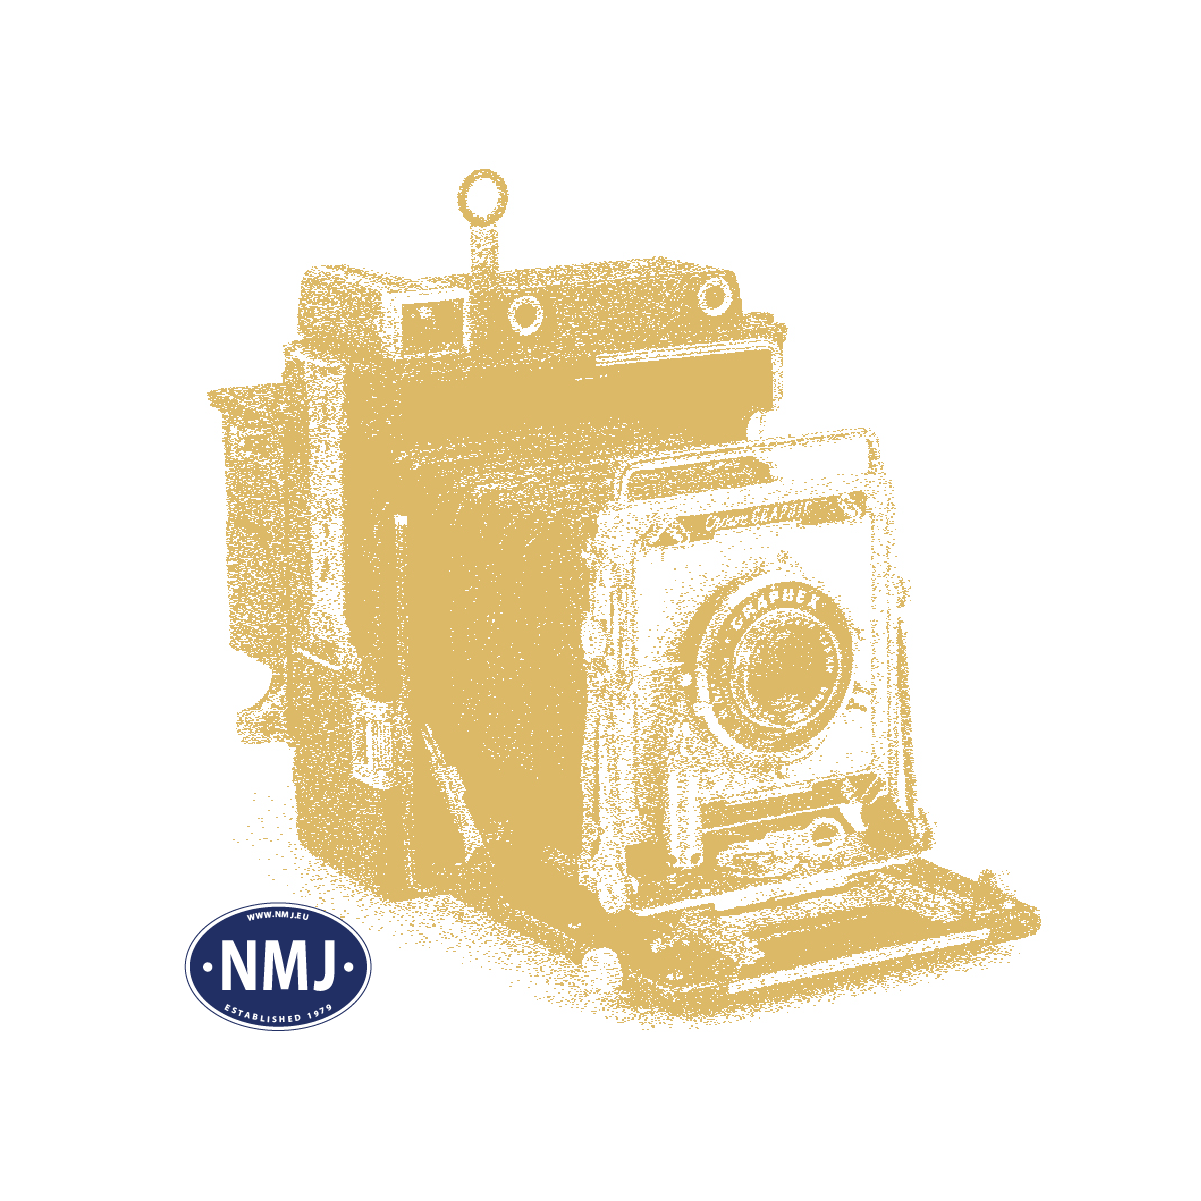 NMJT504.105 - NMJ Topline NSB G5 44008, Original Version